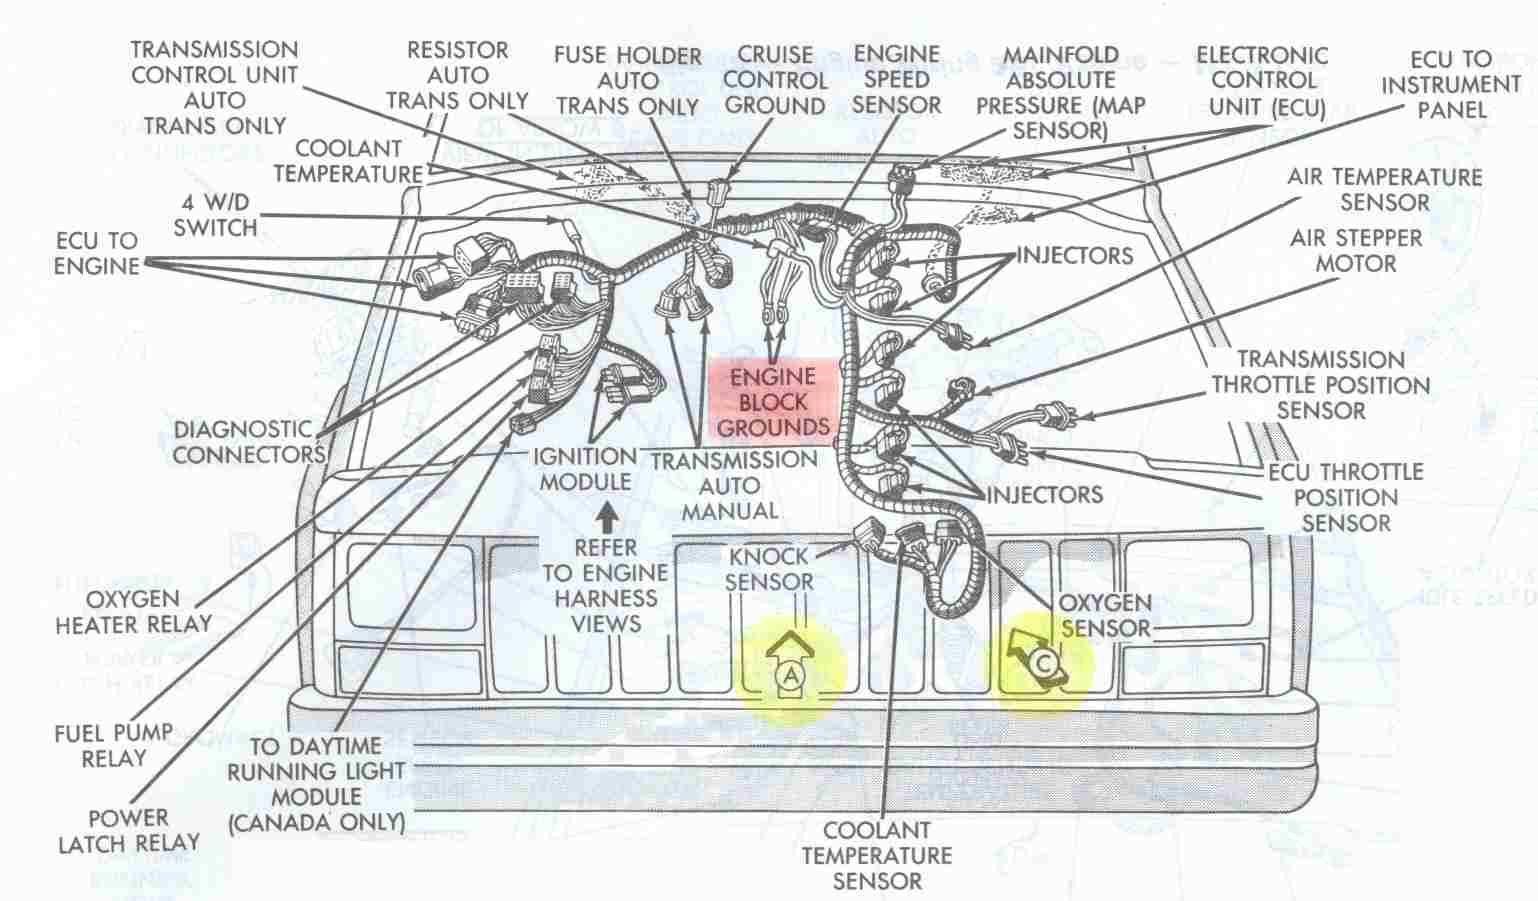 2002 jeep grand cherokee schematic